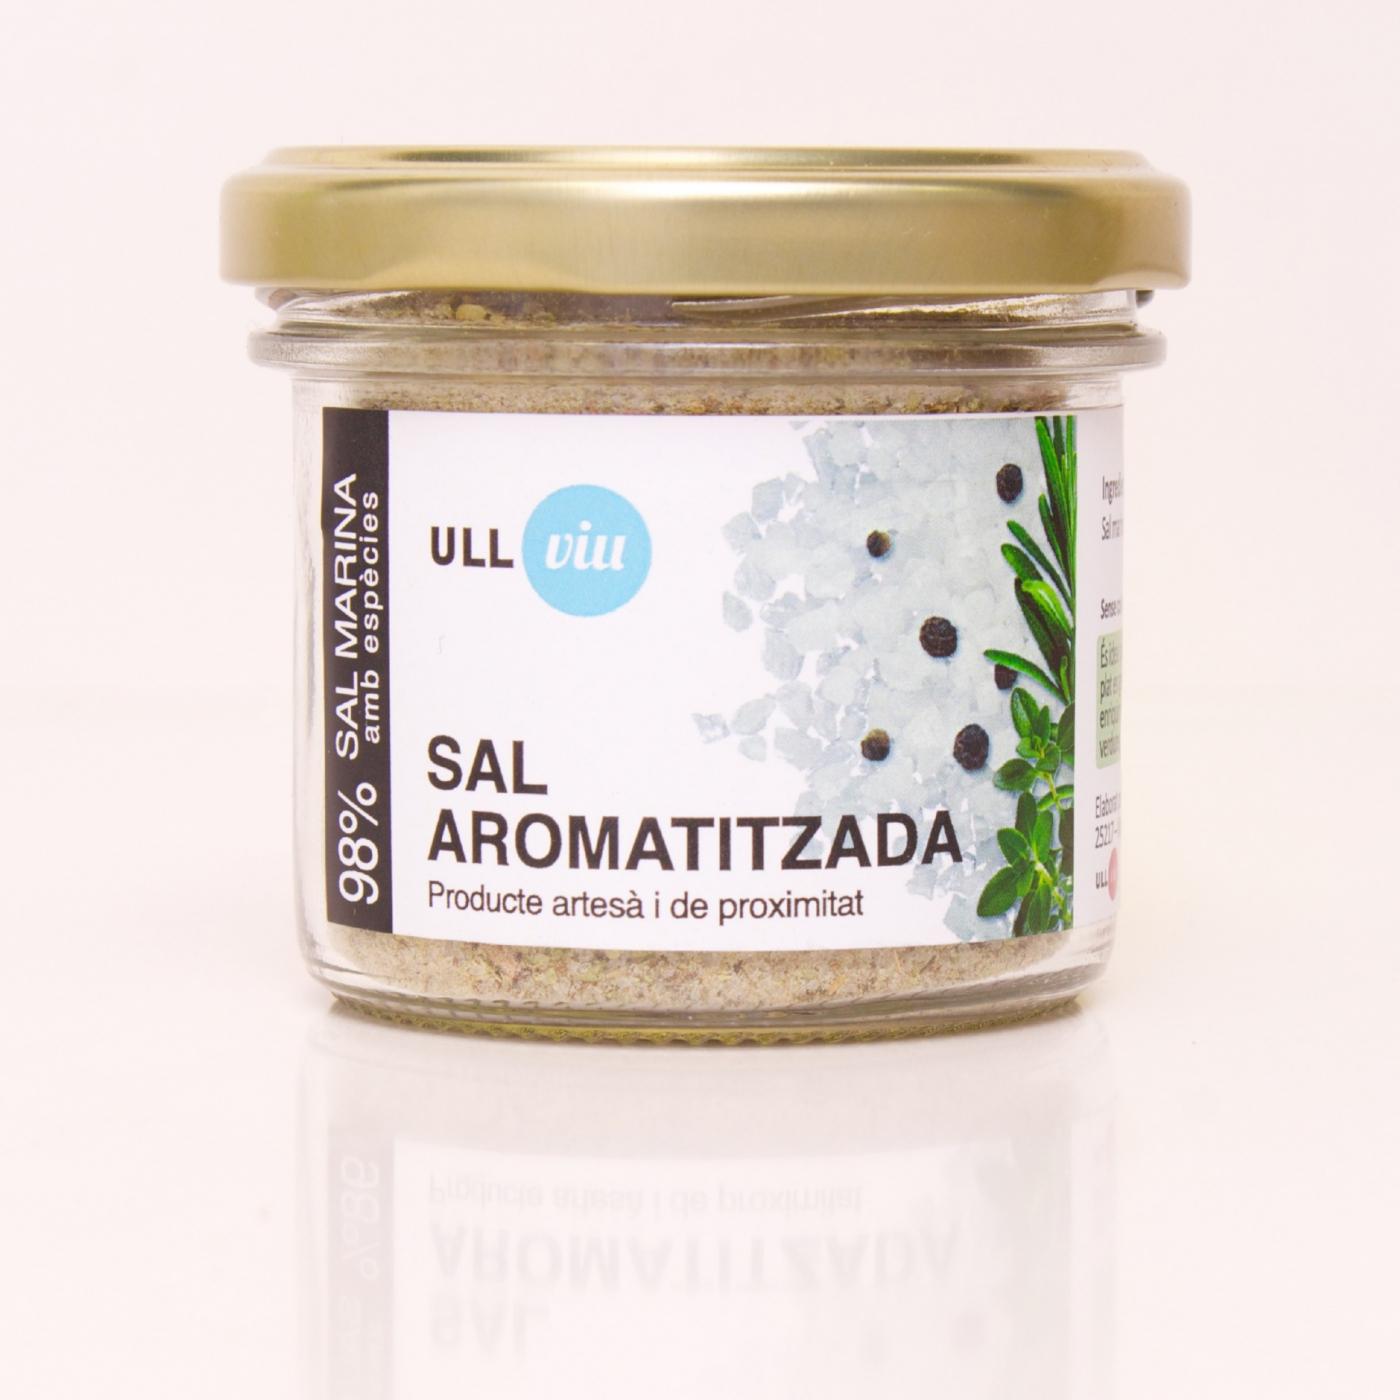 Sal aromatitzada 110 grams -